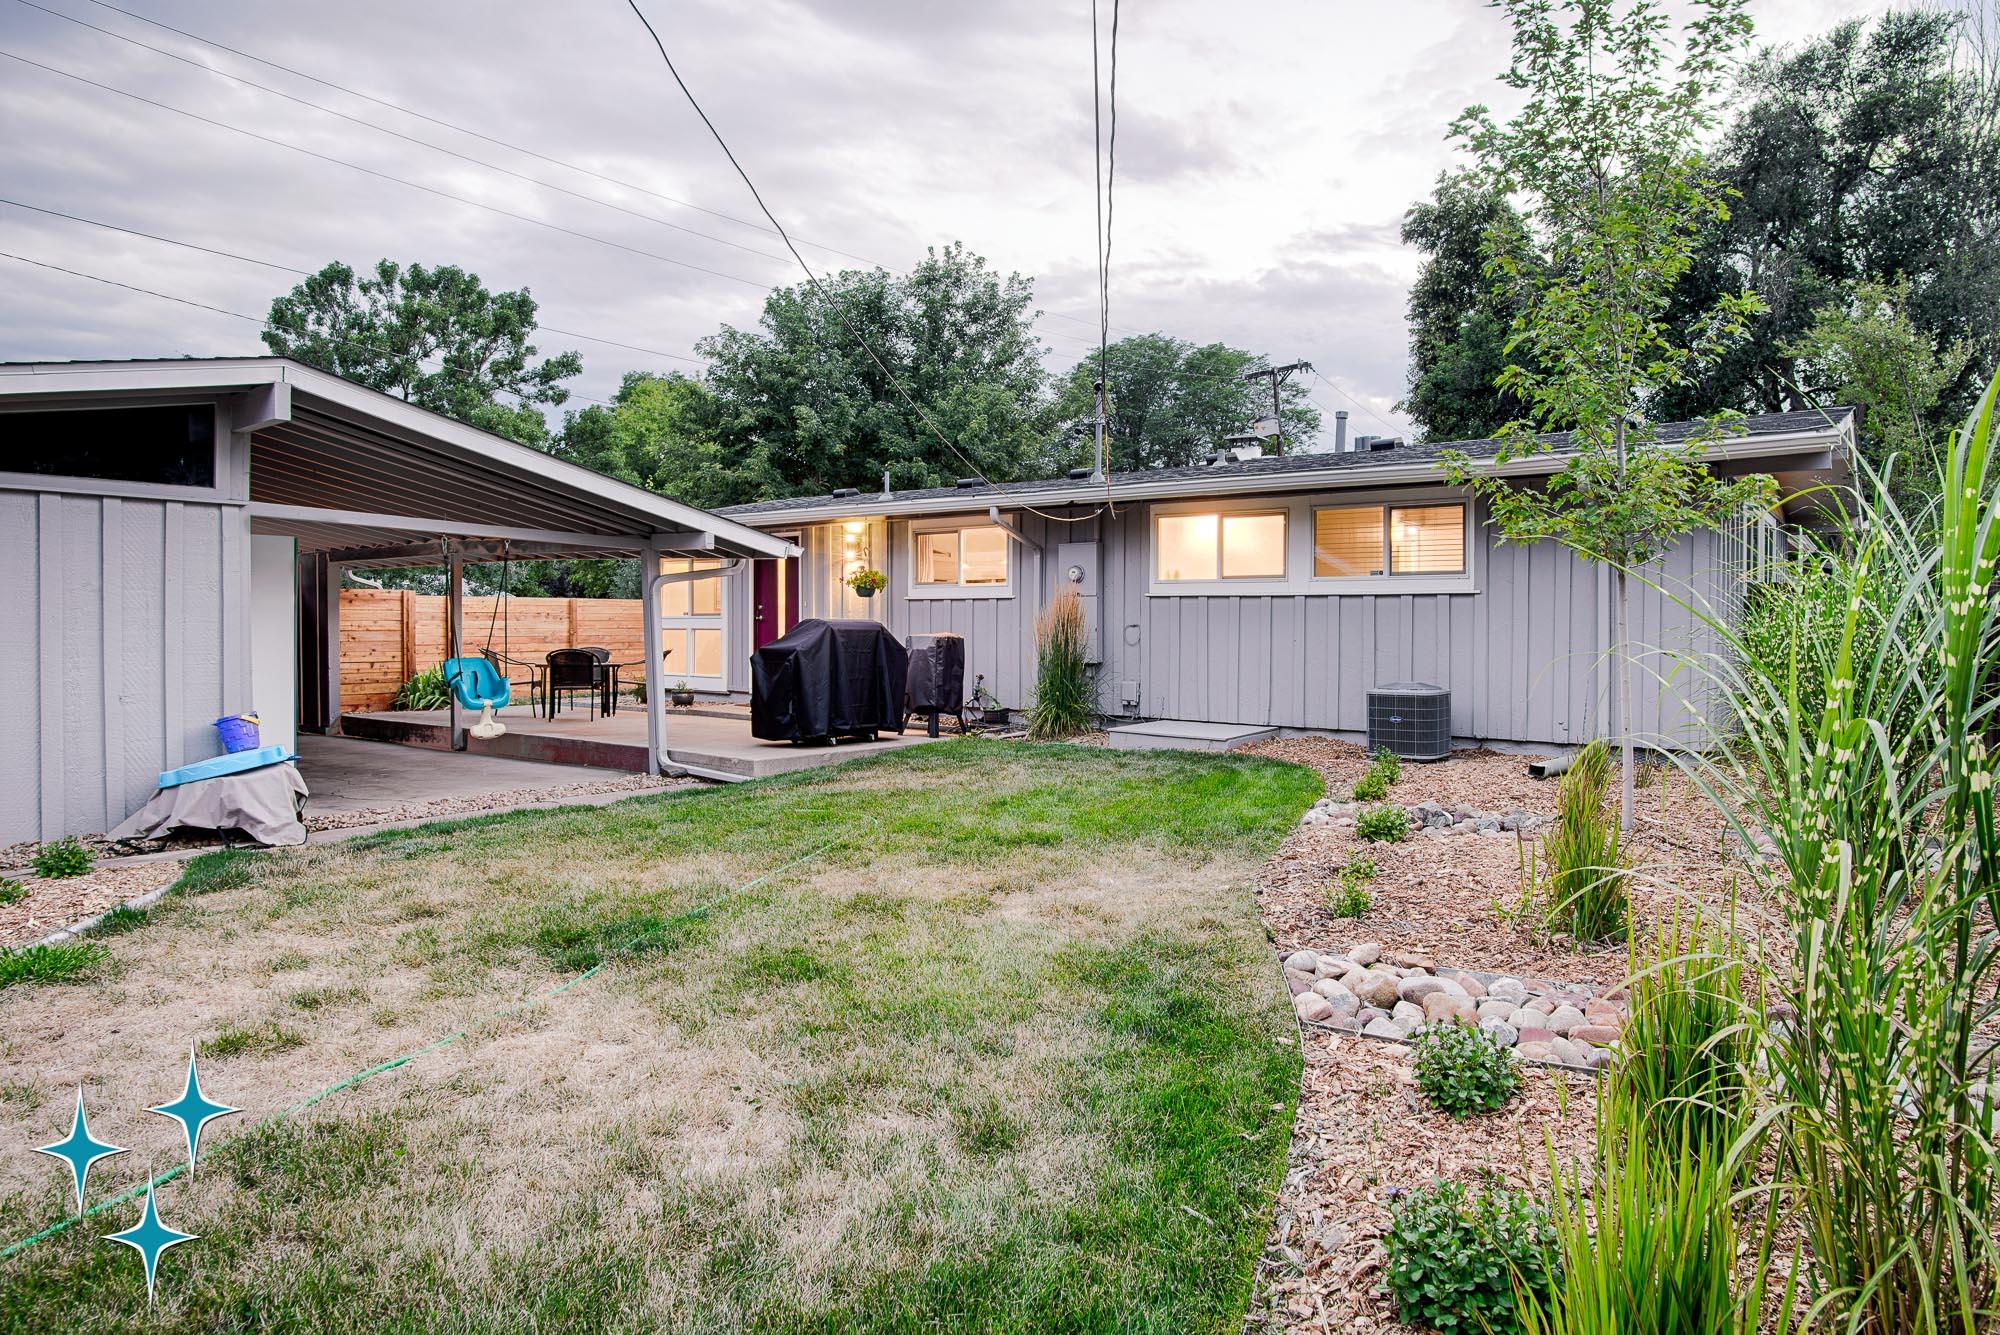 Adrian-Kinney-2480-S-Meade-Street-Denver-Cliff-May-Harvey-Park-2000w50-3SWM-25.jpg